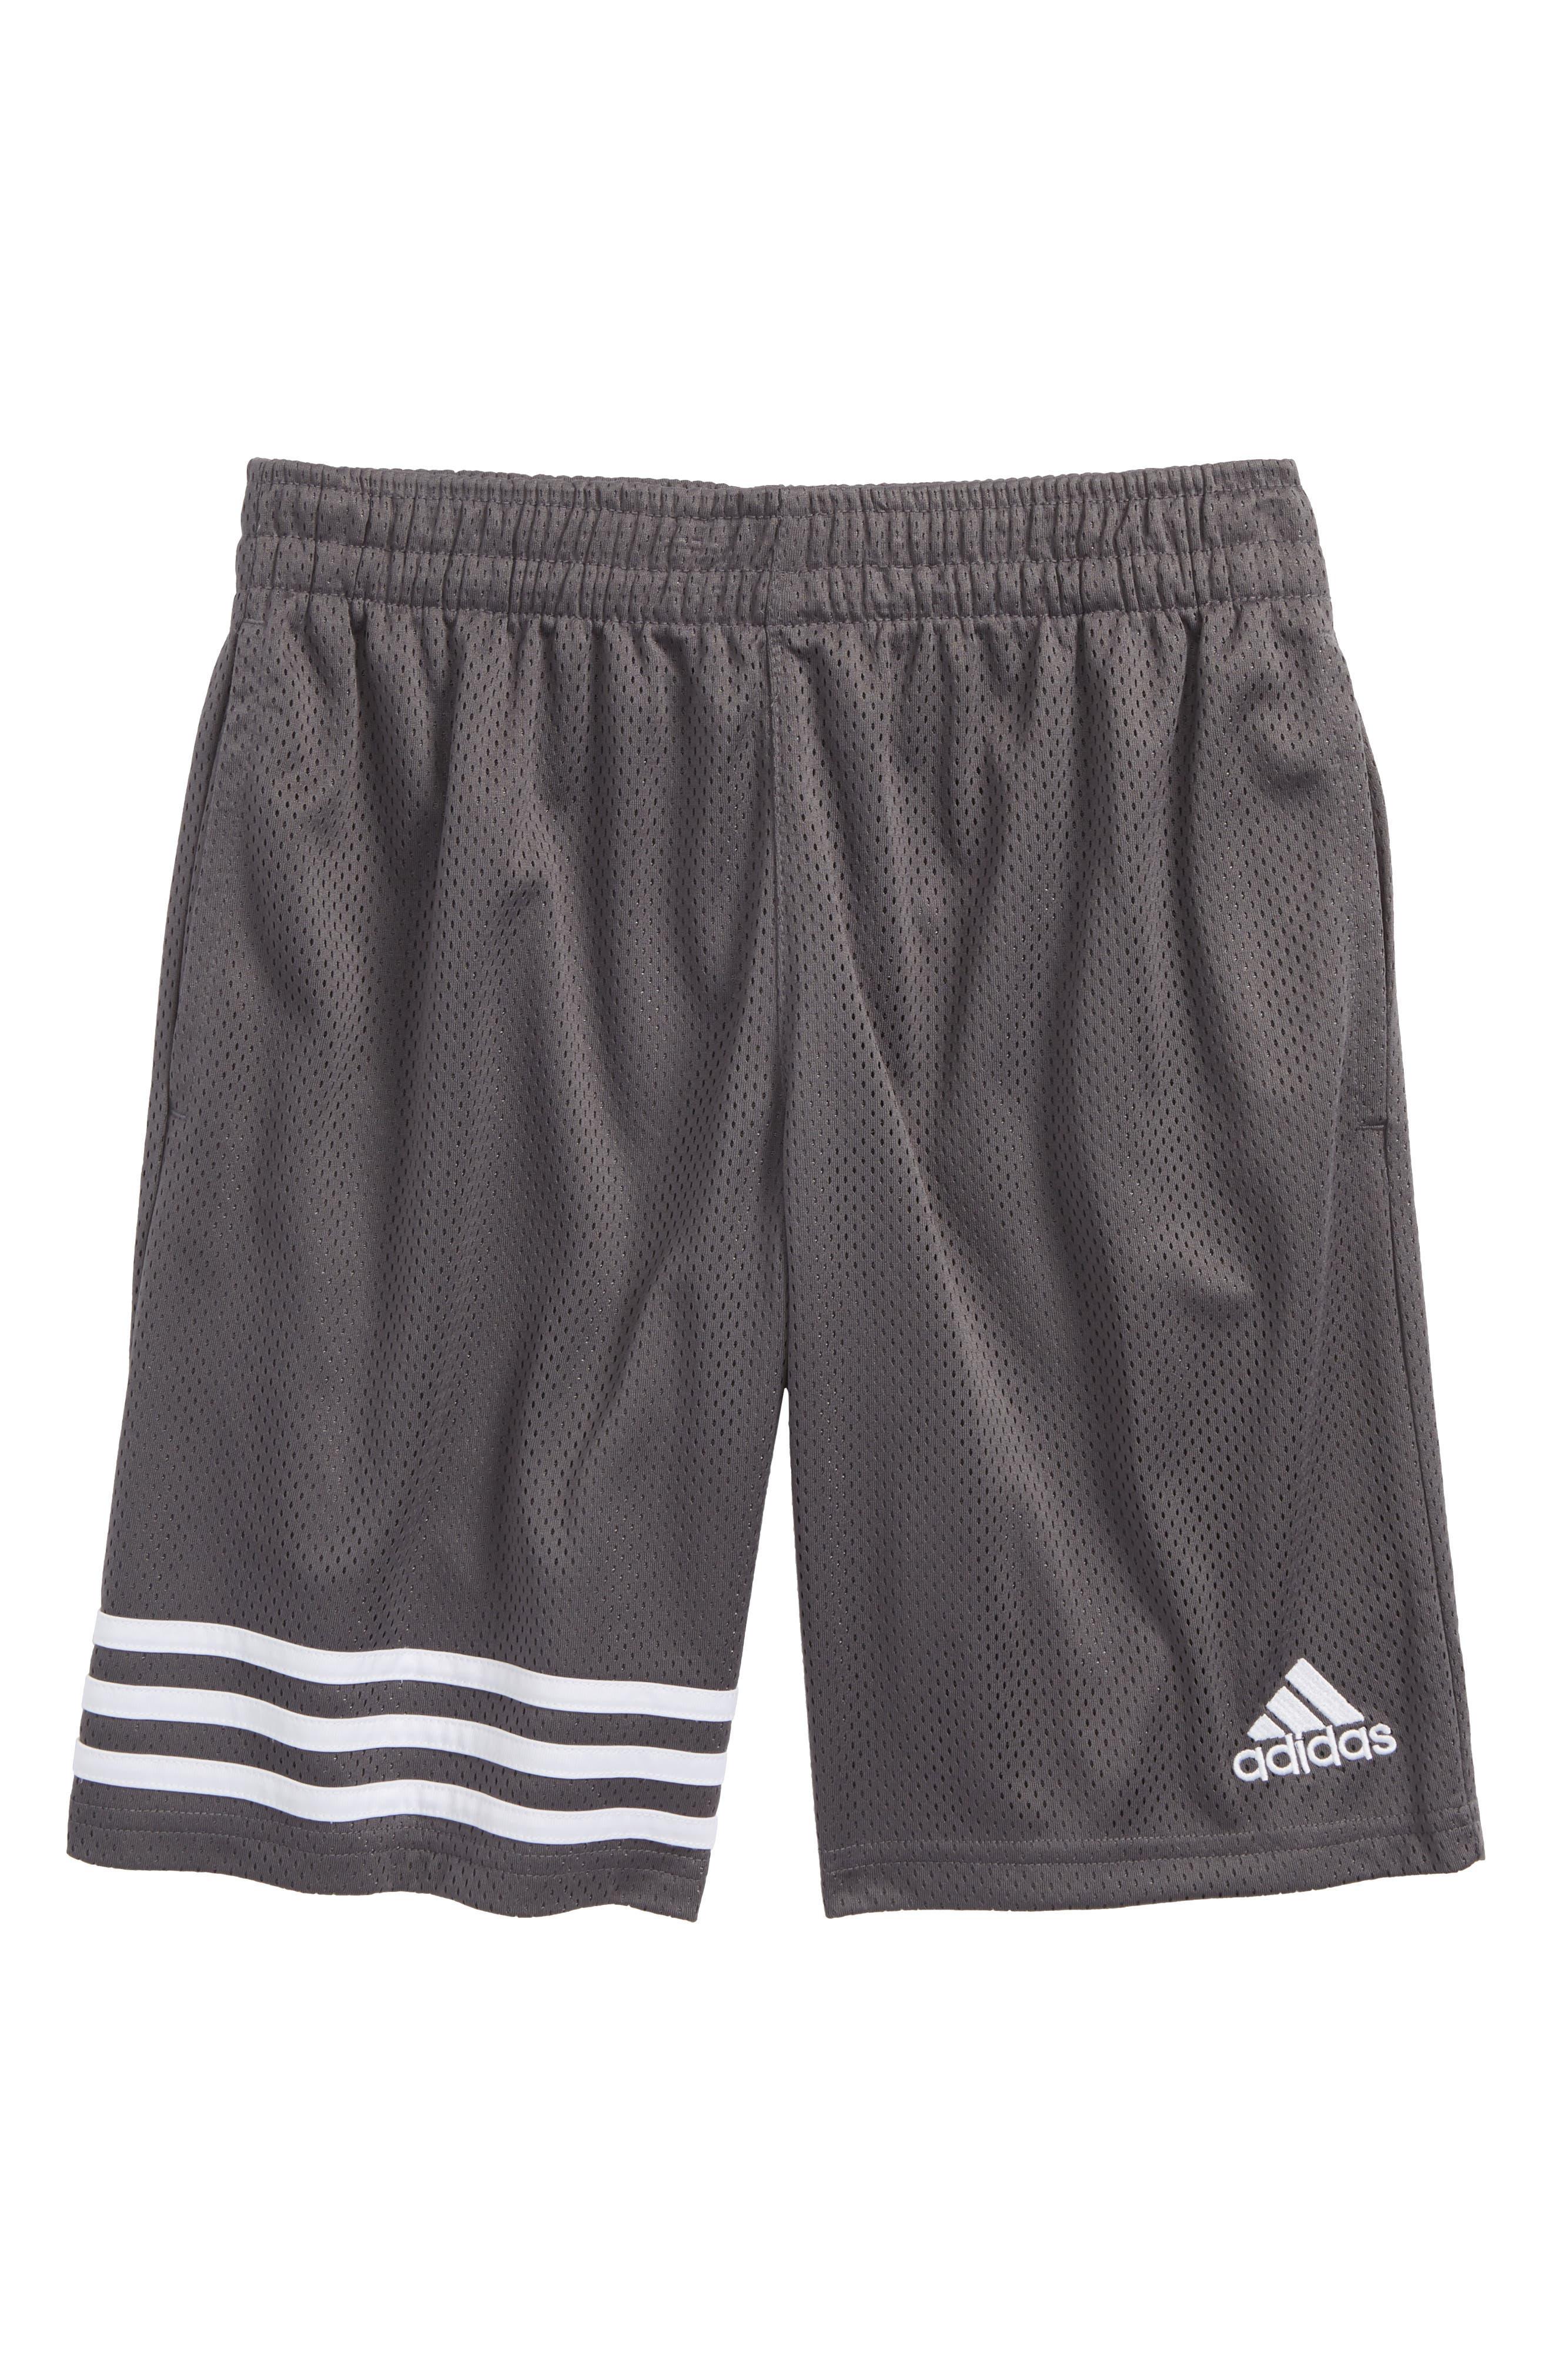 Replenishment Defender Shorts,                             Main thumbnail 1, color,                             Dark Grey